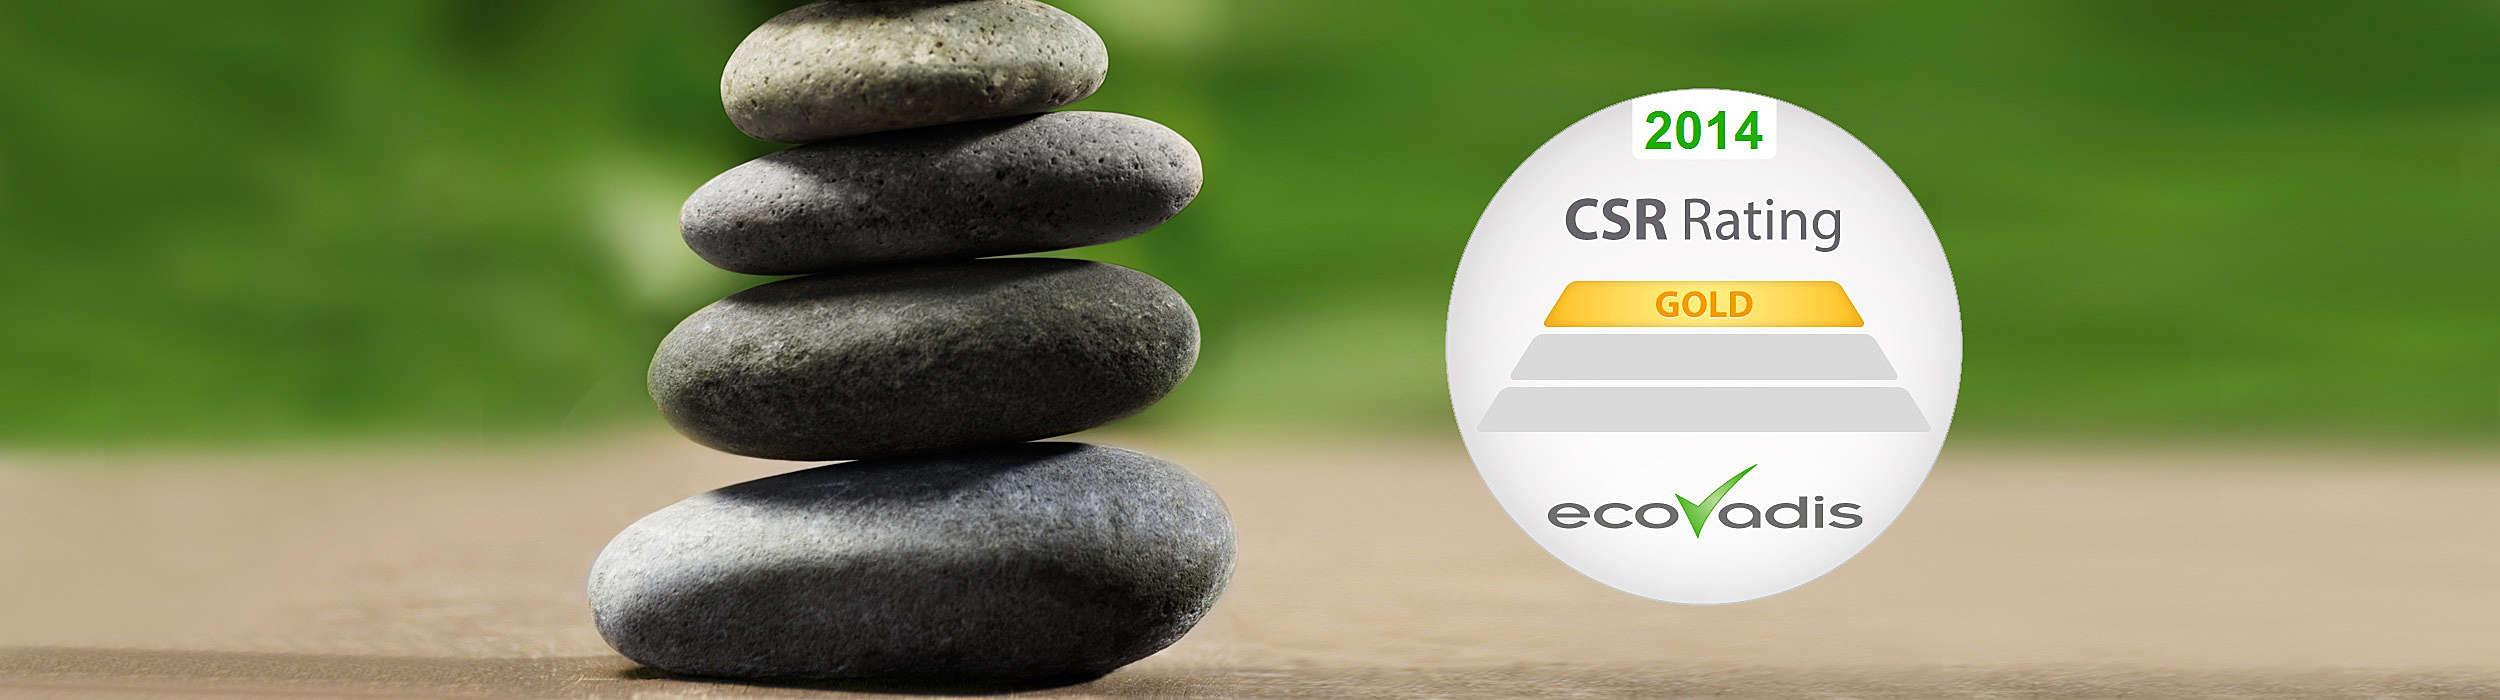 EcoVadis 2014 logo